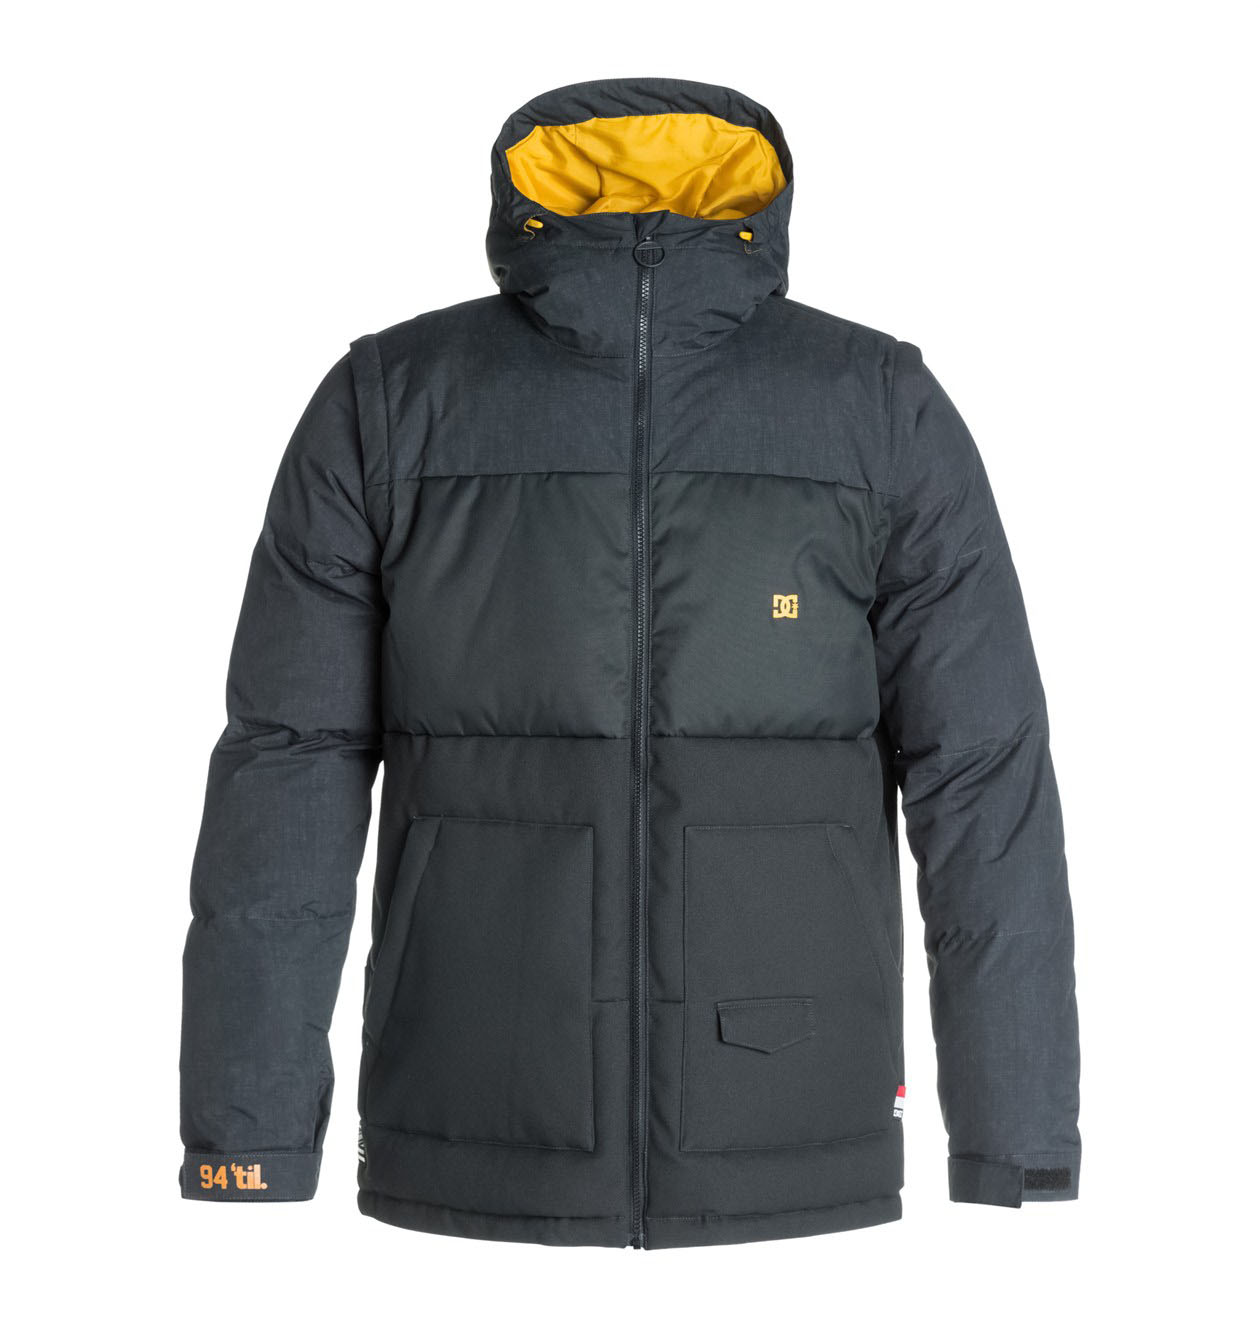 image dc-downhill-jacket-jpg